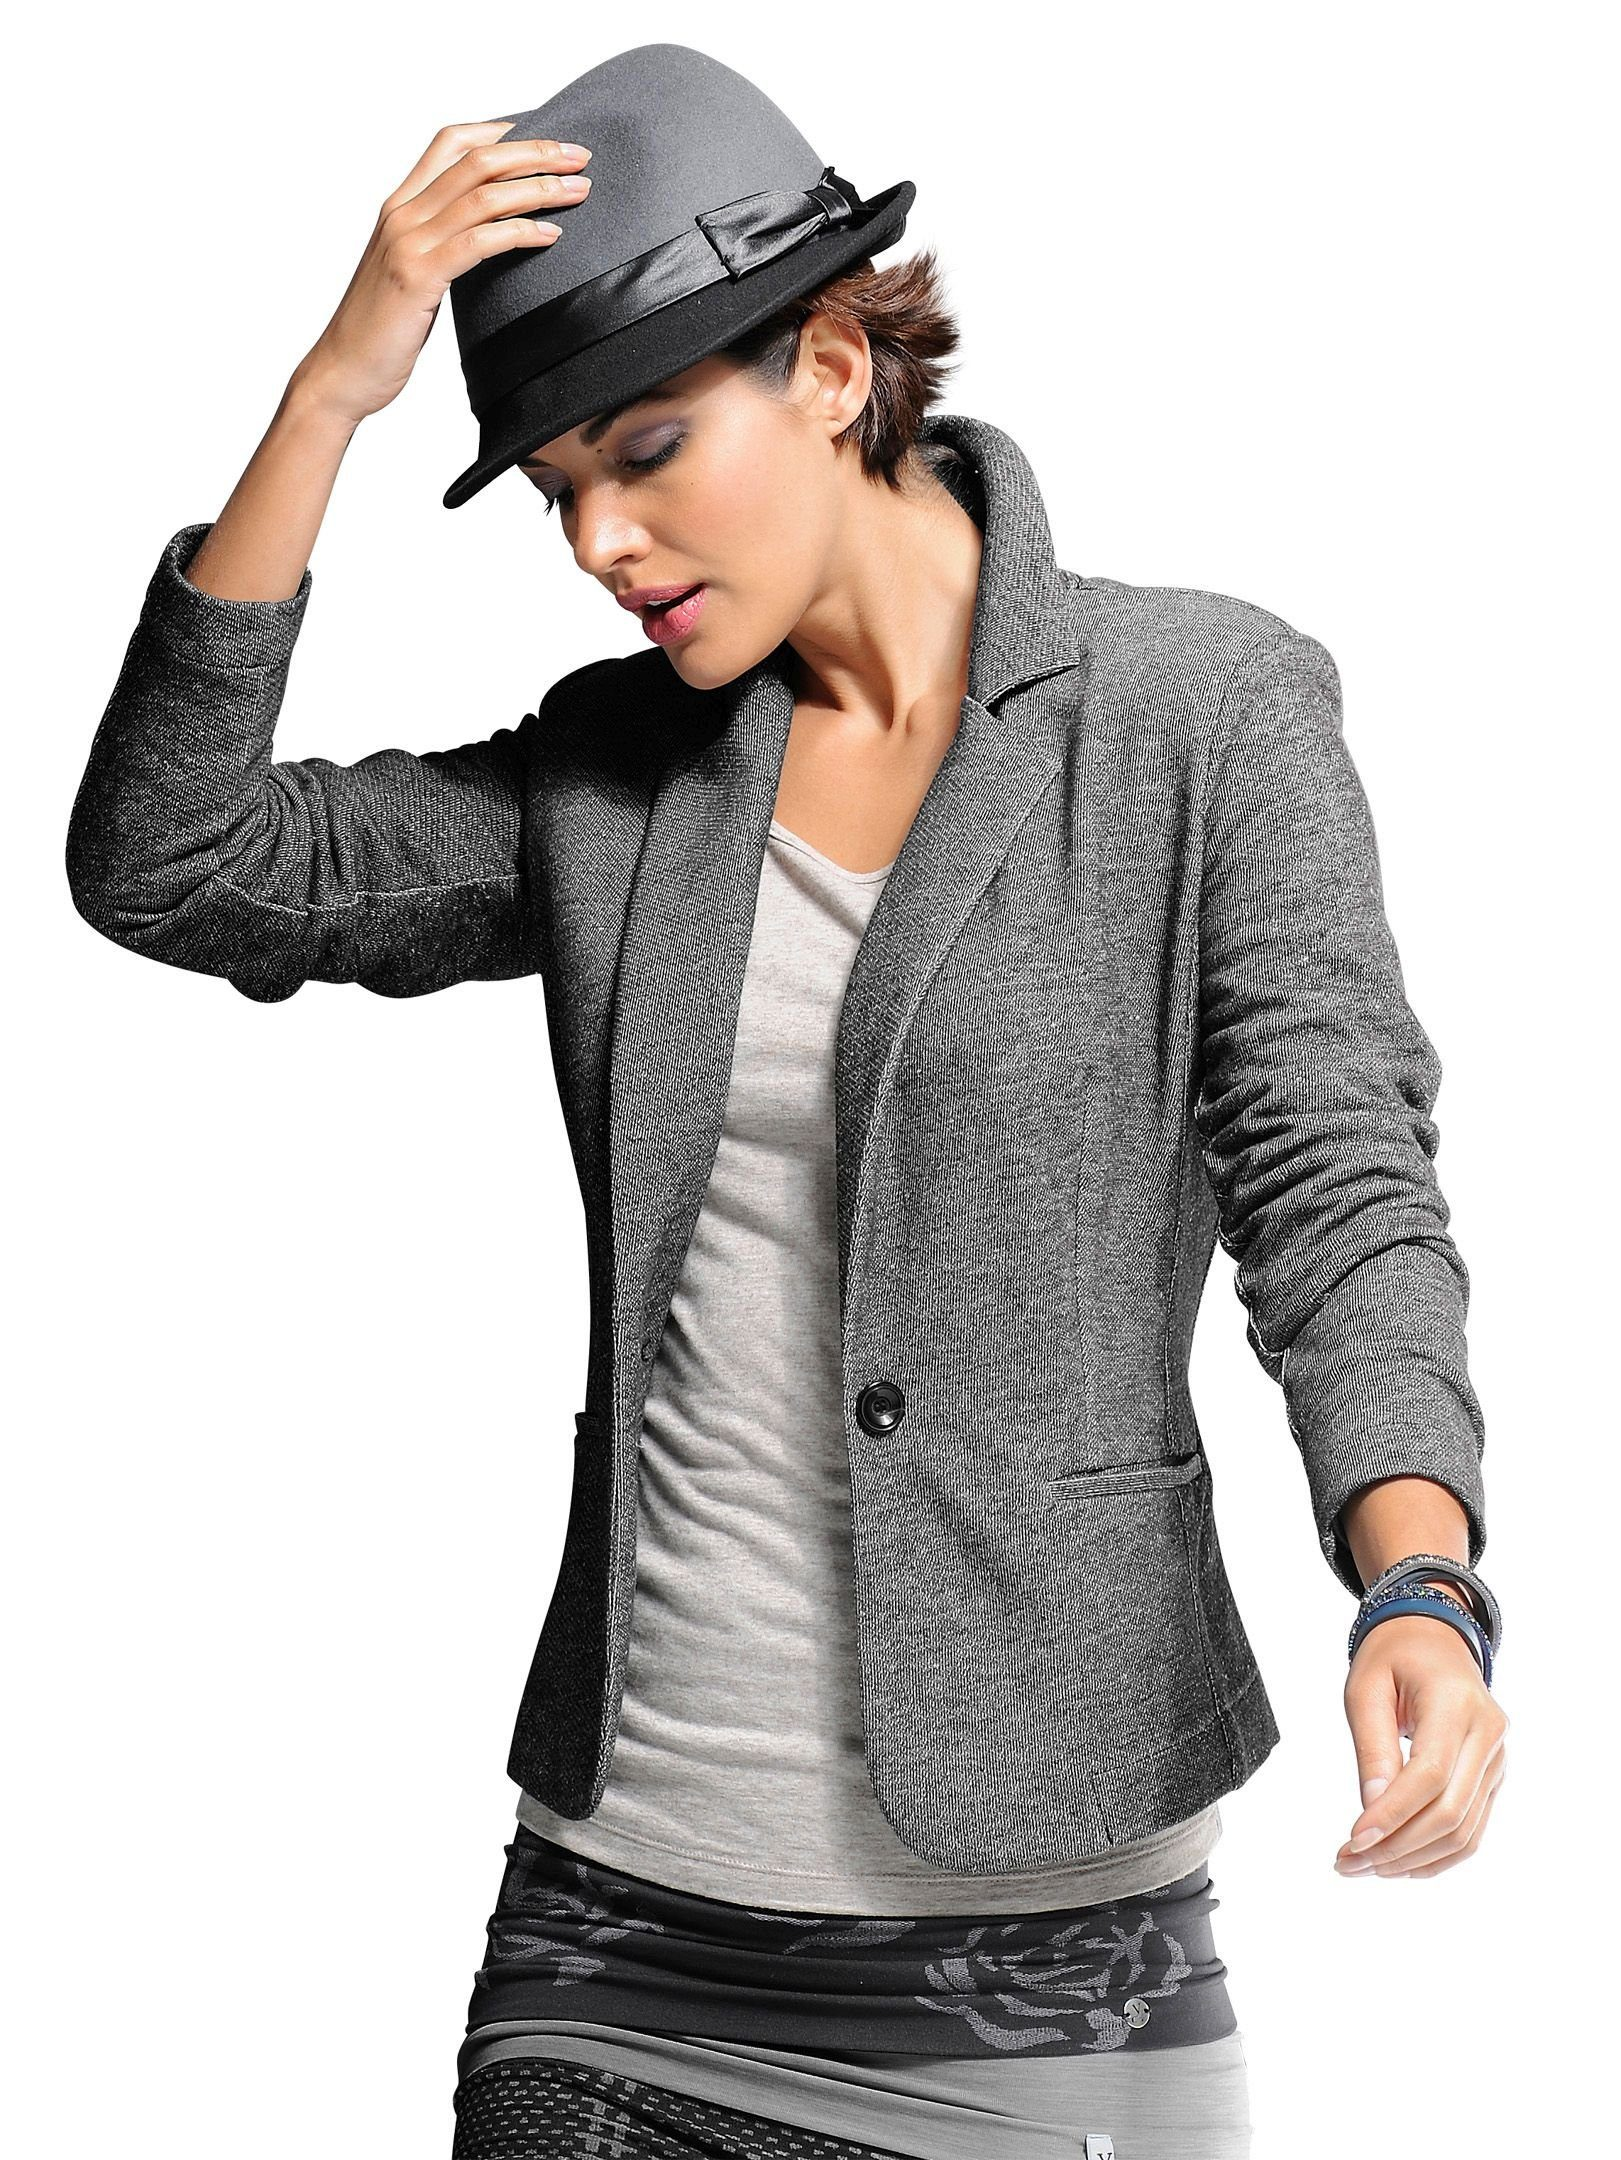 alba moda sweatblazer in modischer two tone jerseyqualit t. Black Bedroom Furniture Sets. Home Design Ideas